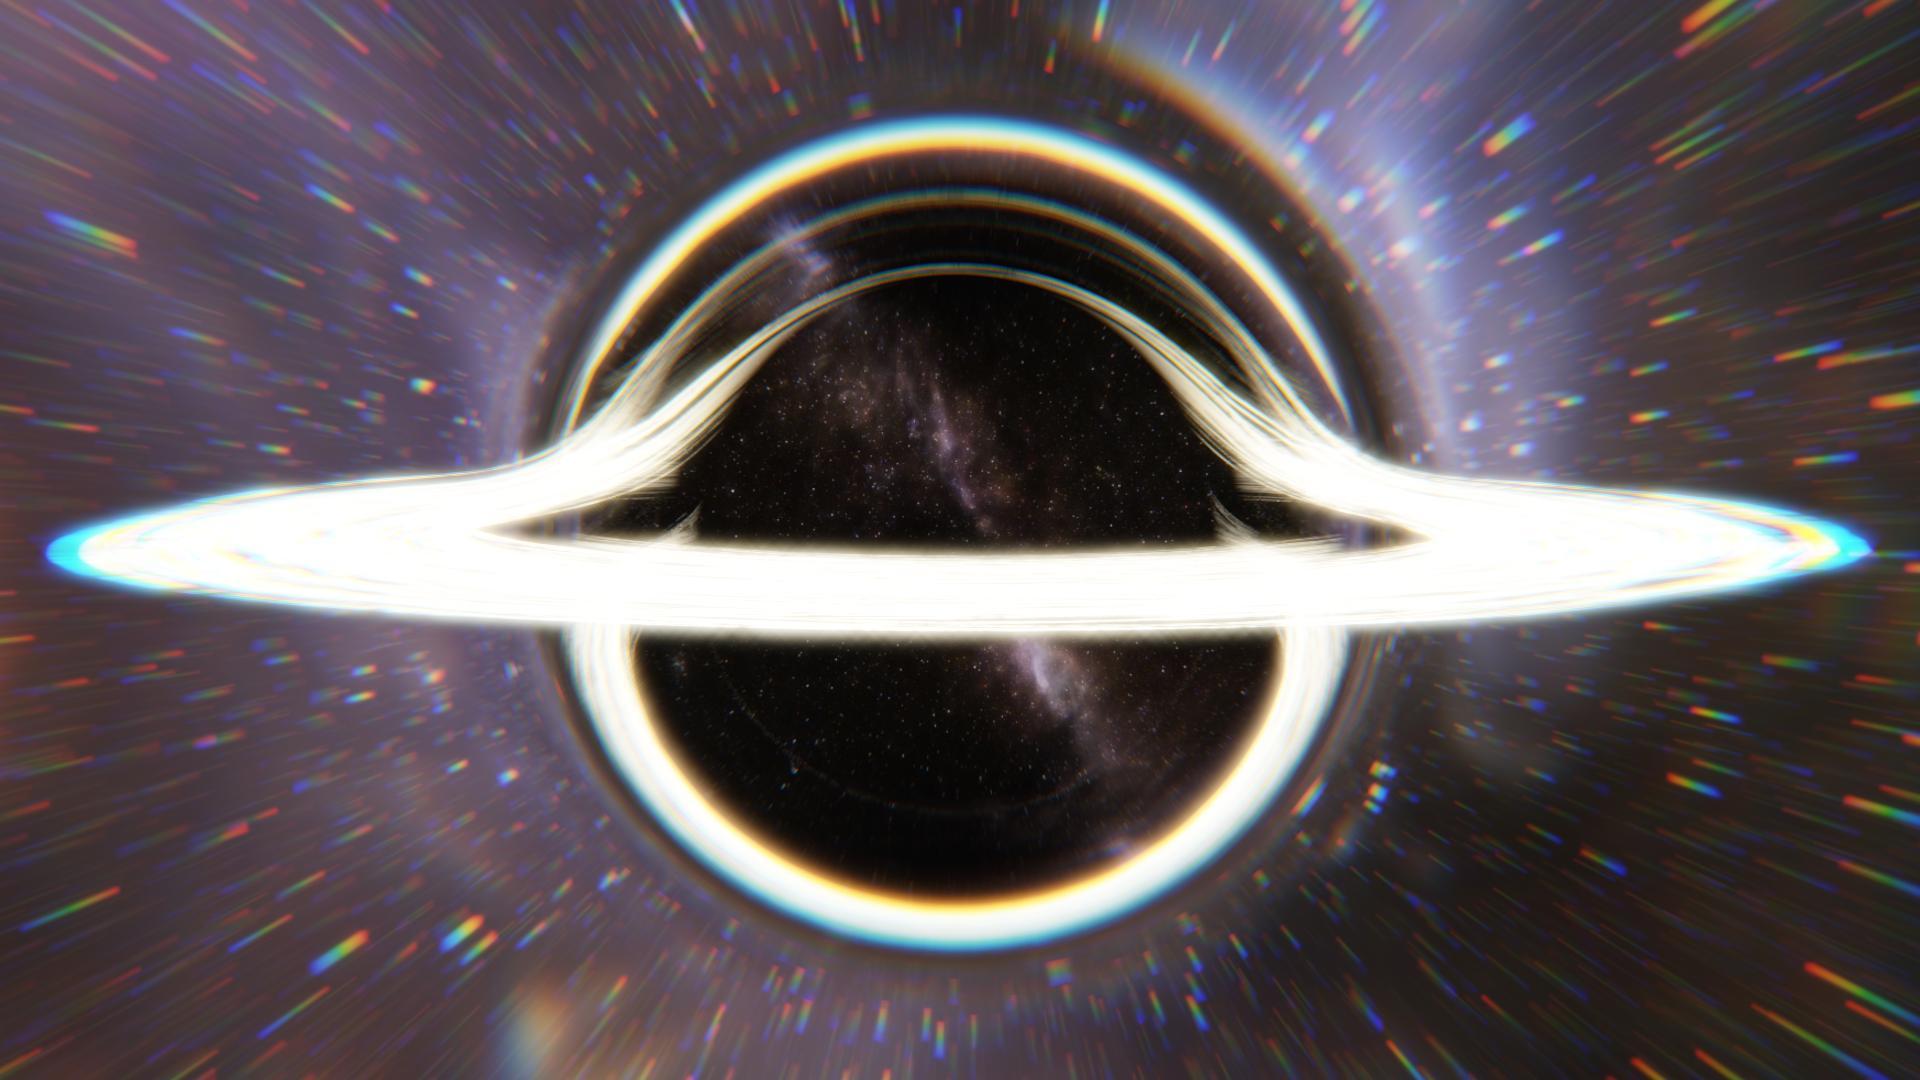 Overclocking Vega 64 is stability nightmare - Blog